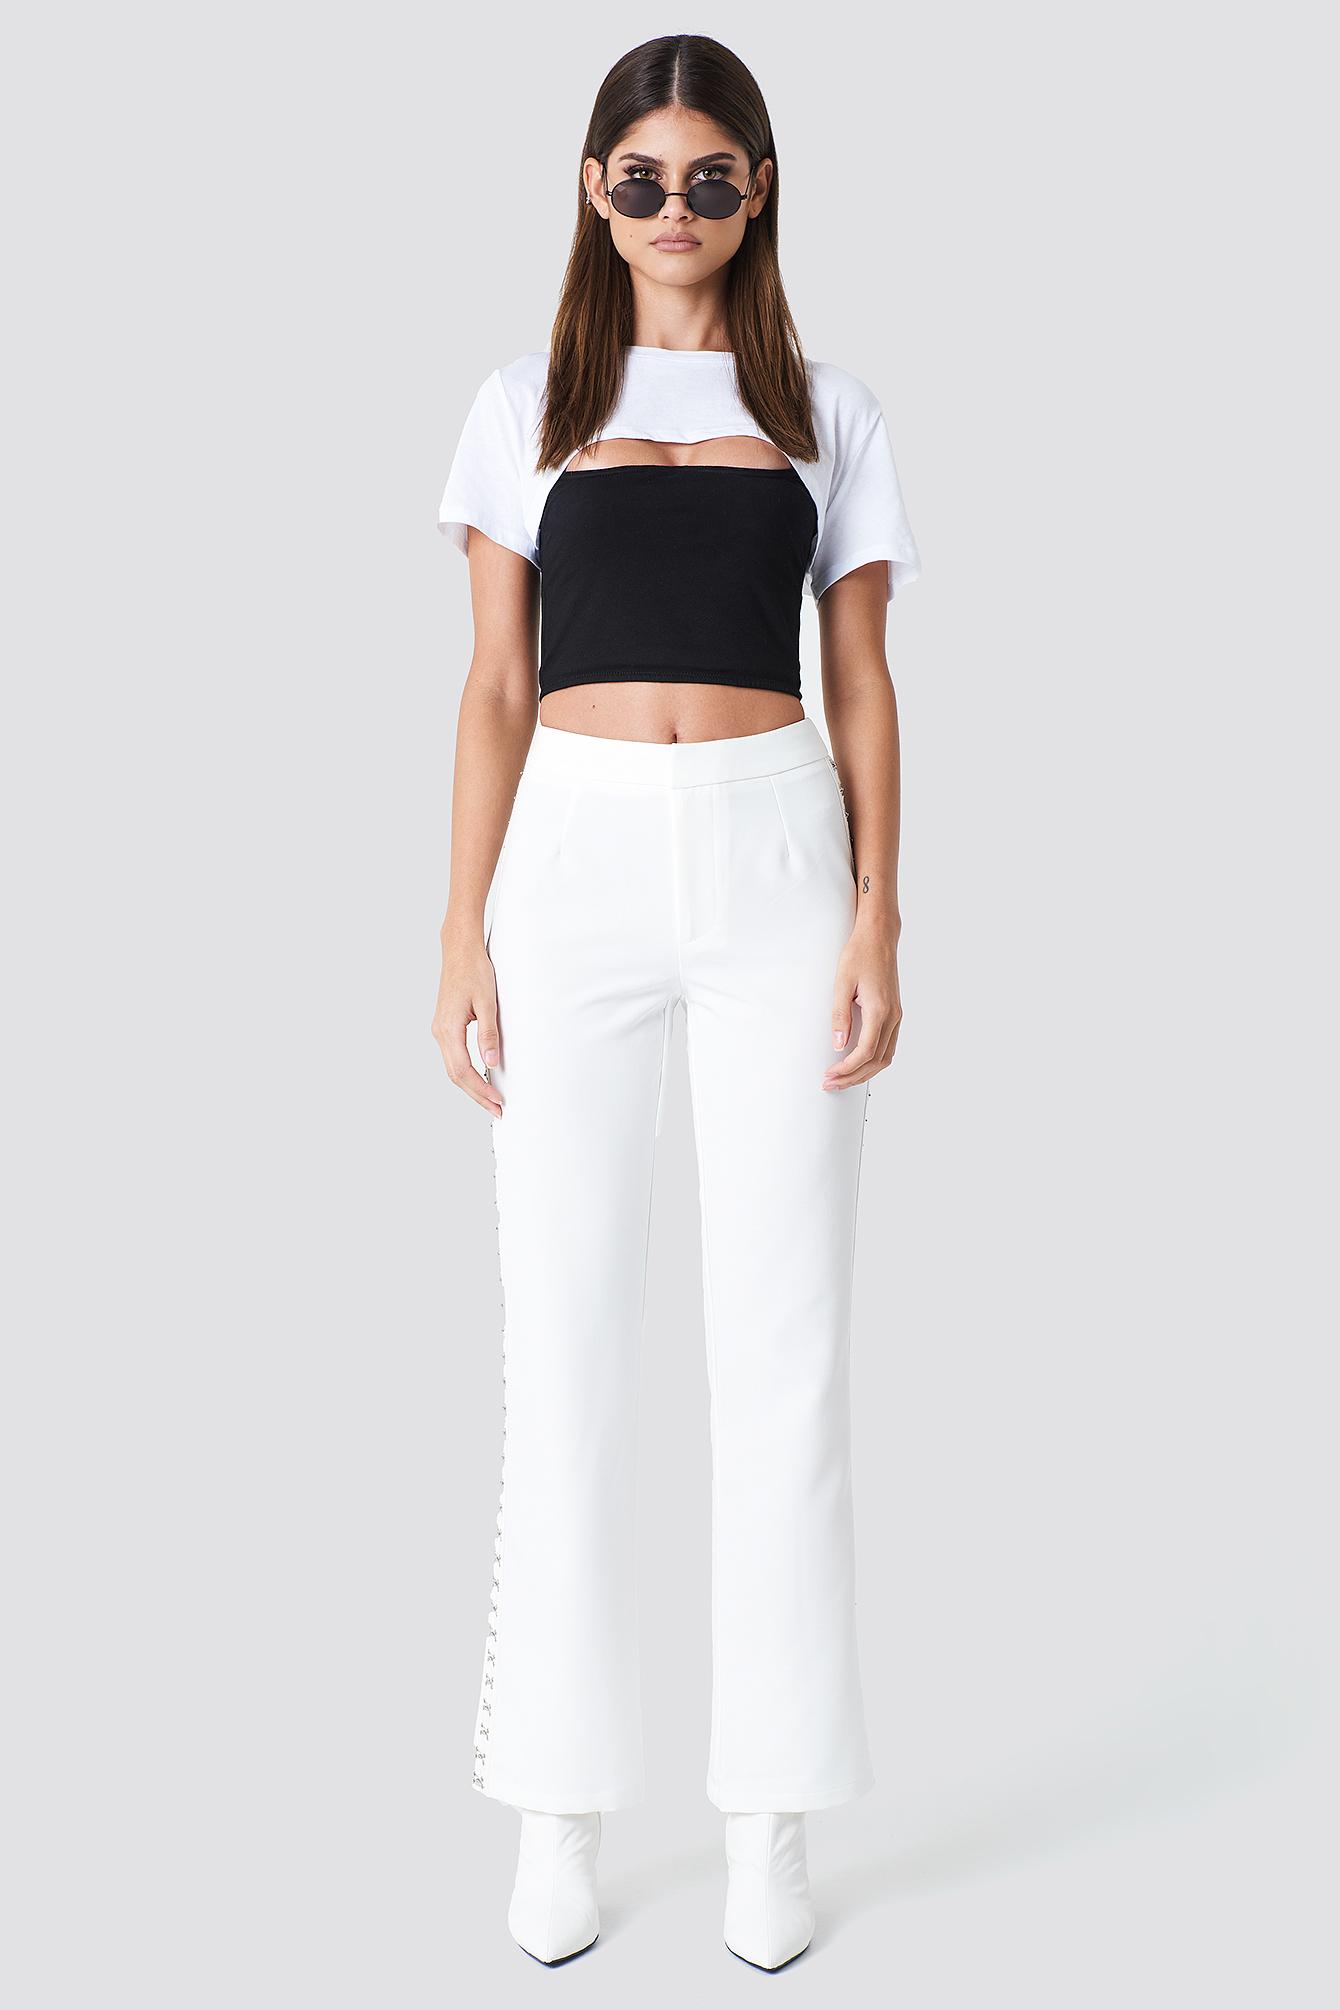 SAHARA RAY X NA-KD HOOK AND EYE PANTS - WHITE